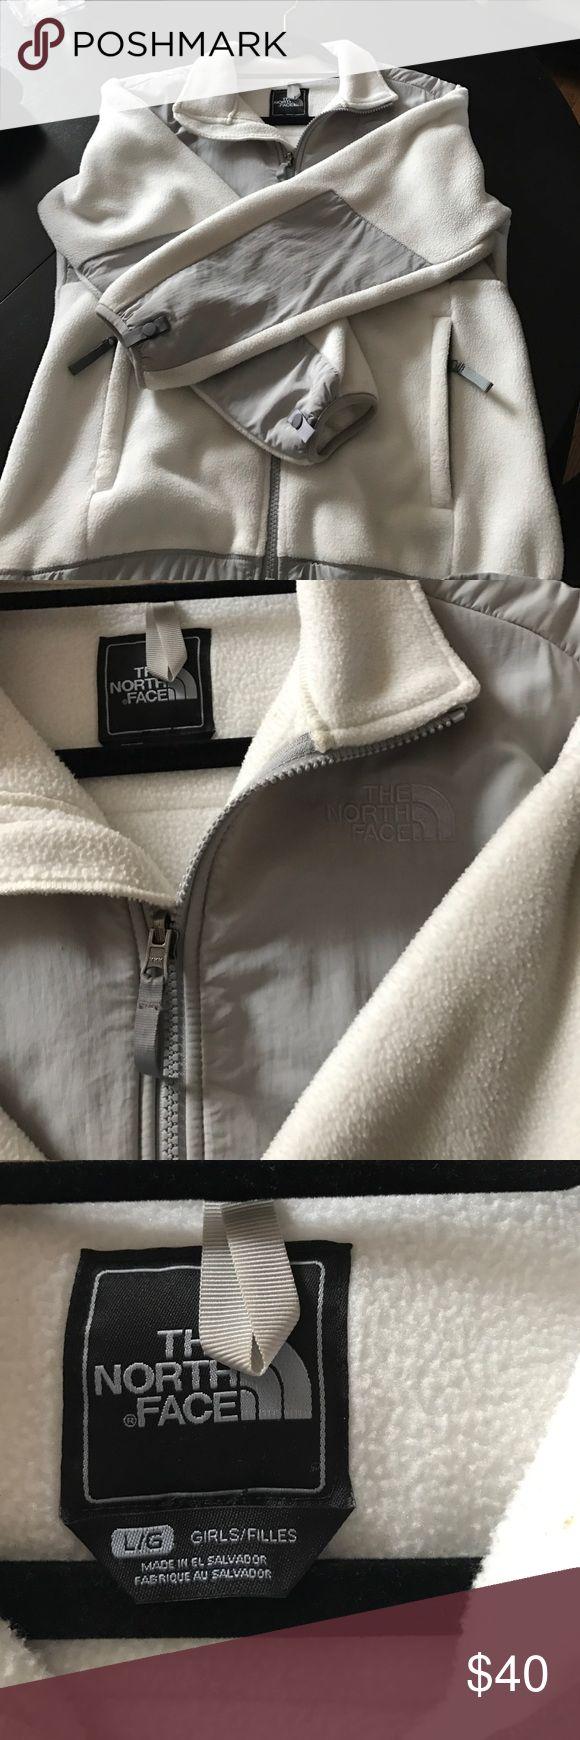 Girls north face jacket Girls large( women's xs) cream/white and grey fleece jacket The North Face Jackets & Coats Utility Jackets